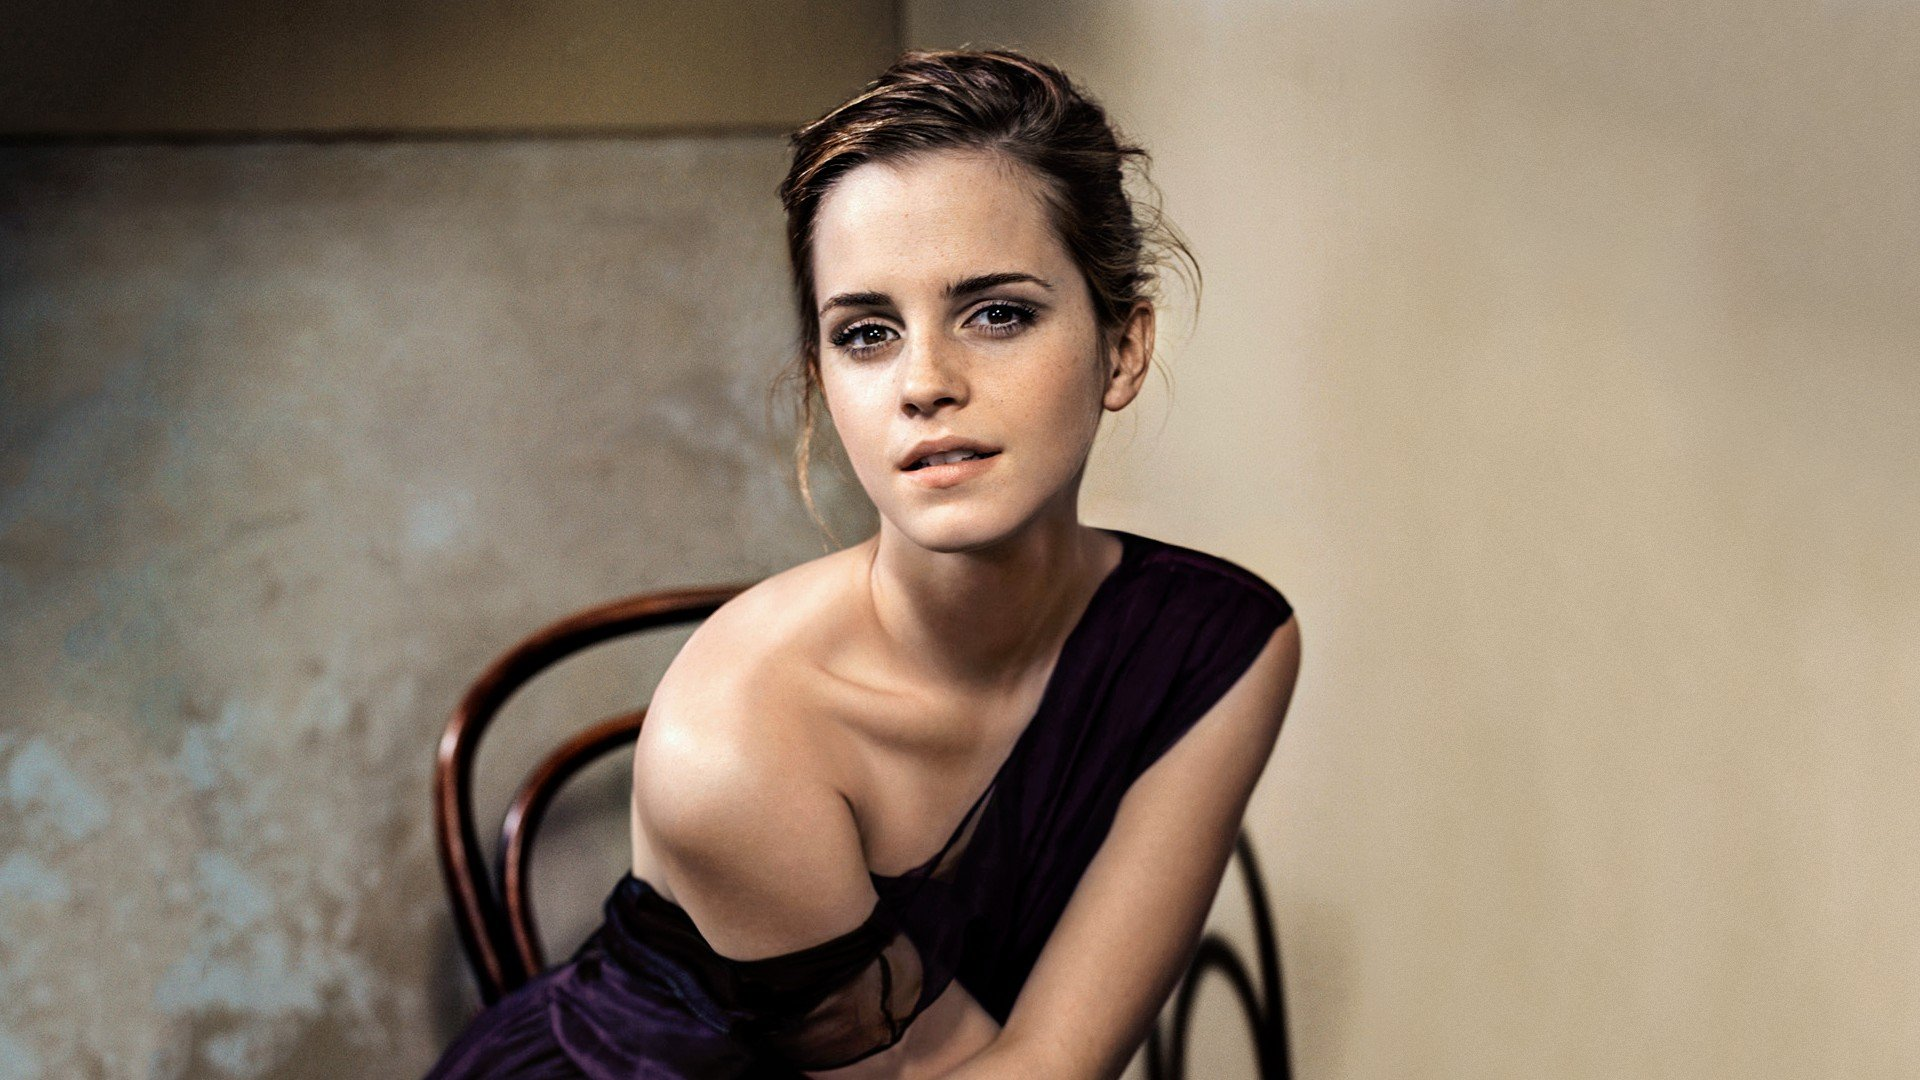 Actress Wallpaper For Mobile 26: Emma Watson, Women, Brunette, Actress HD Wallpapers